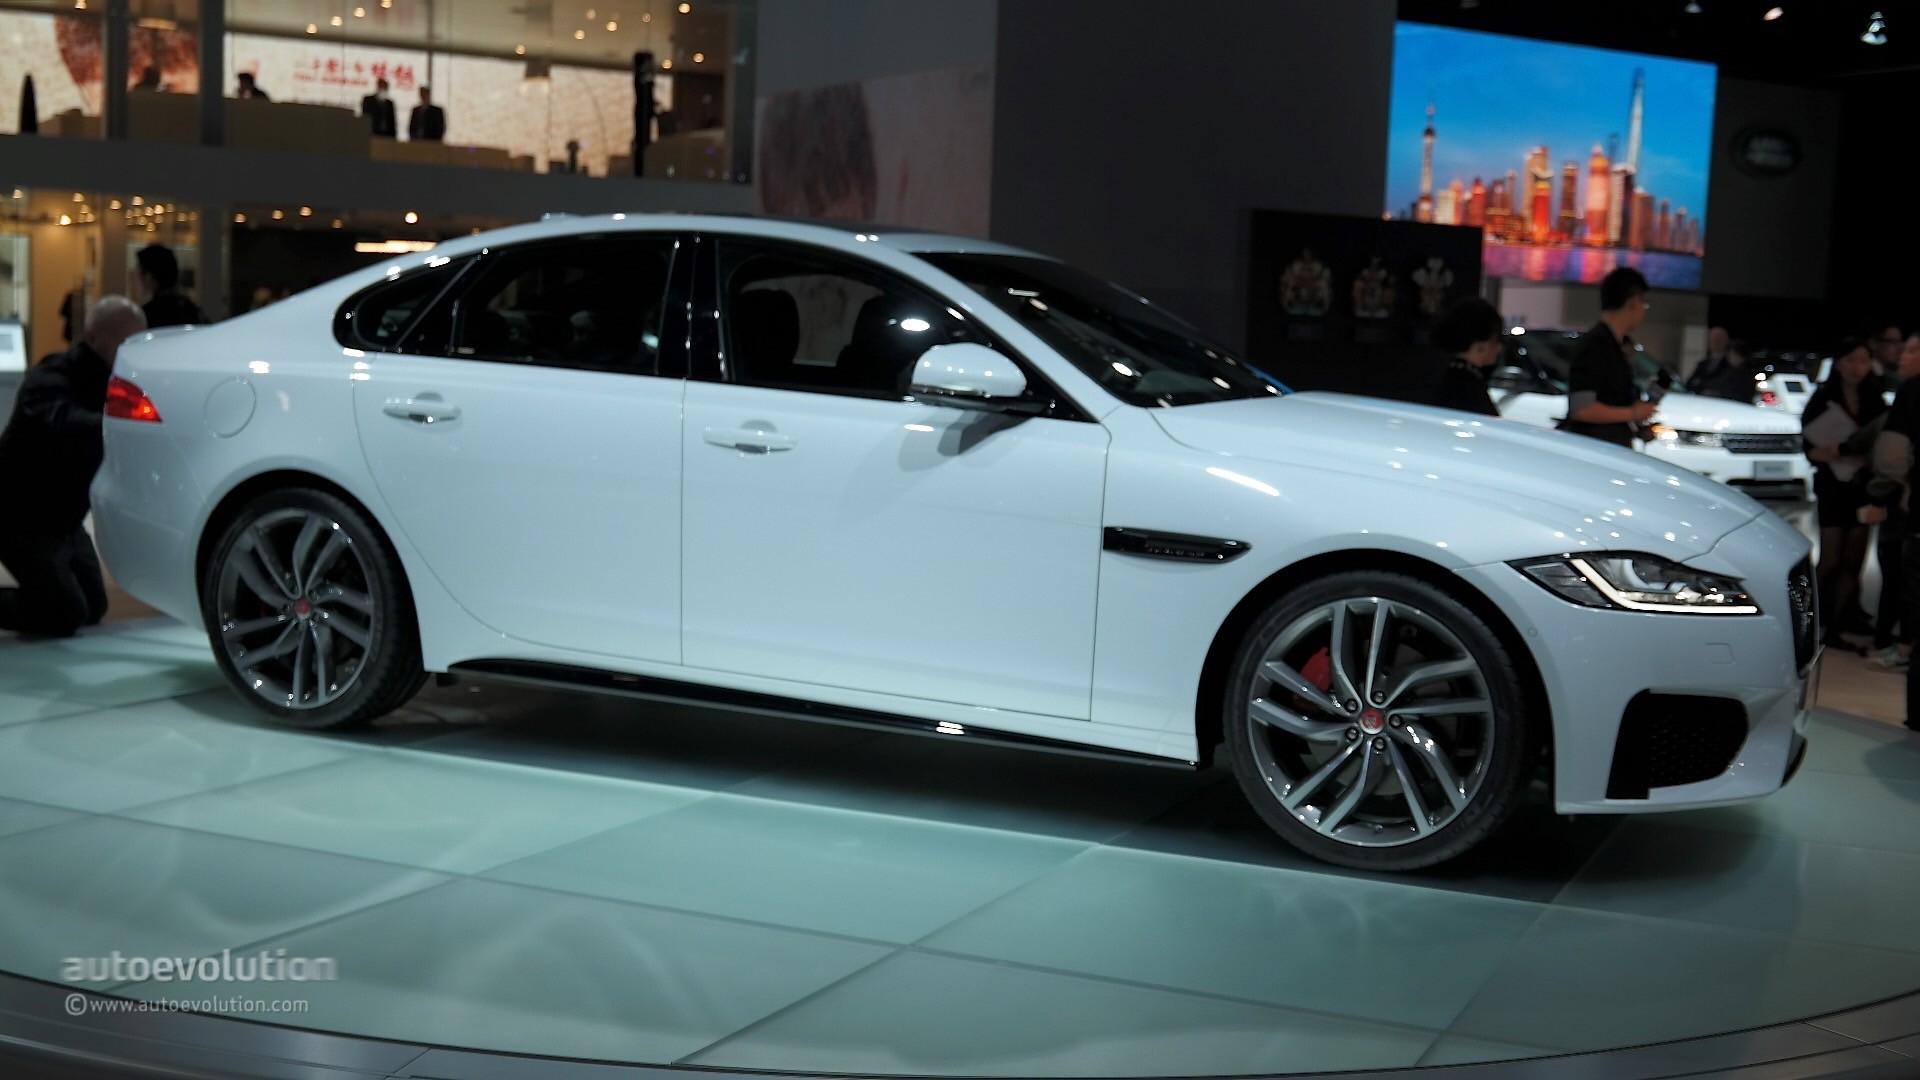 price road news review teaser xf portfolio alt awd jaguar carcostcanada test